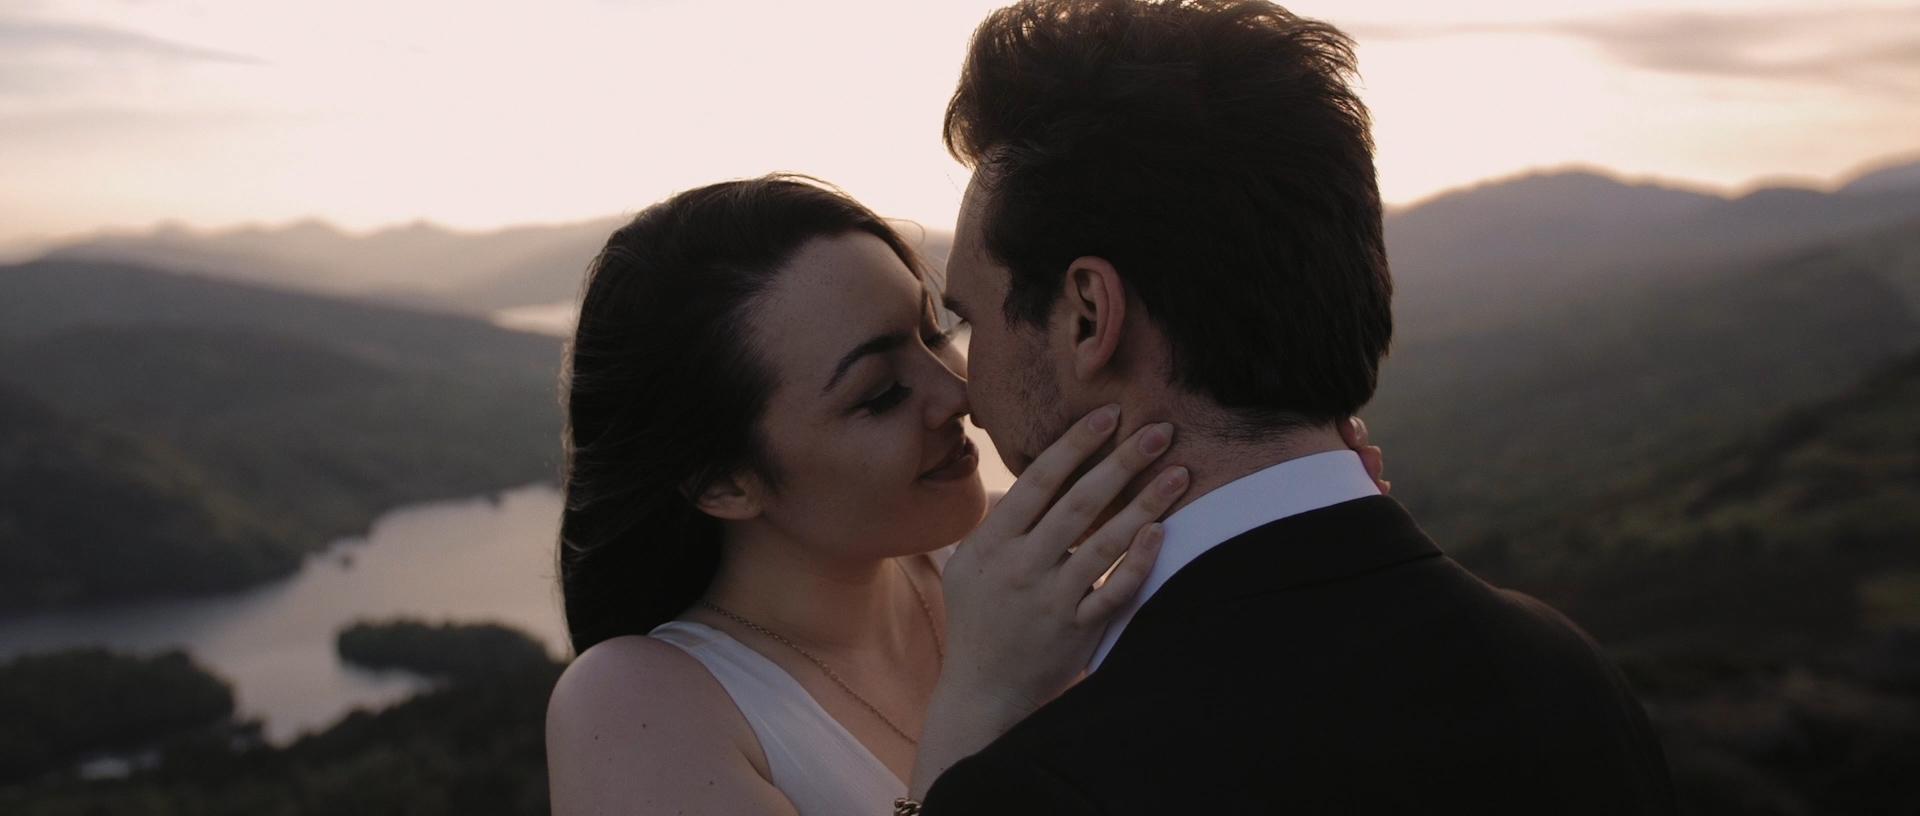 the-byre-at-inchyra-wedding-videographer_LL_09.jpg